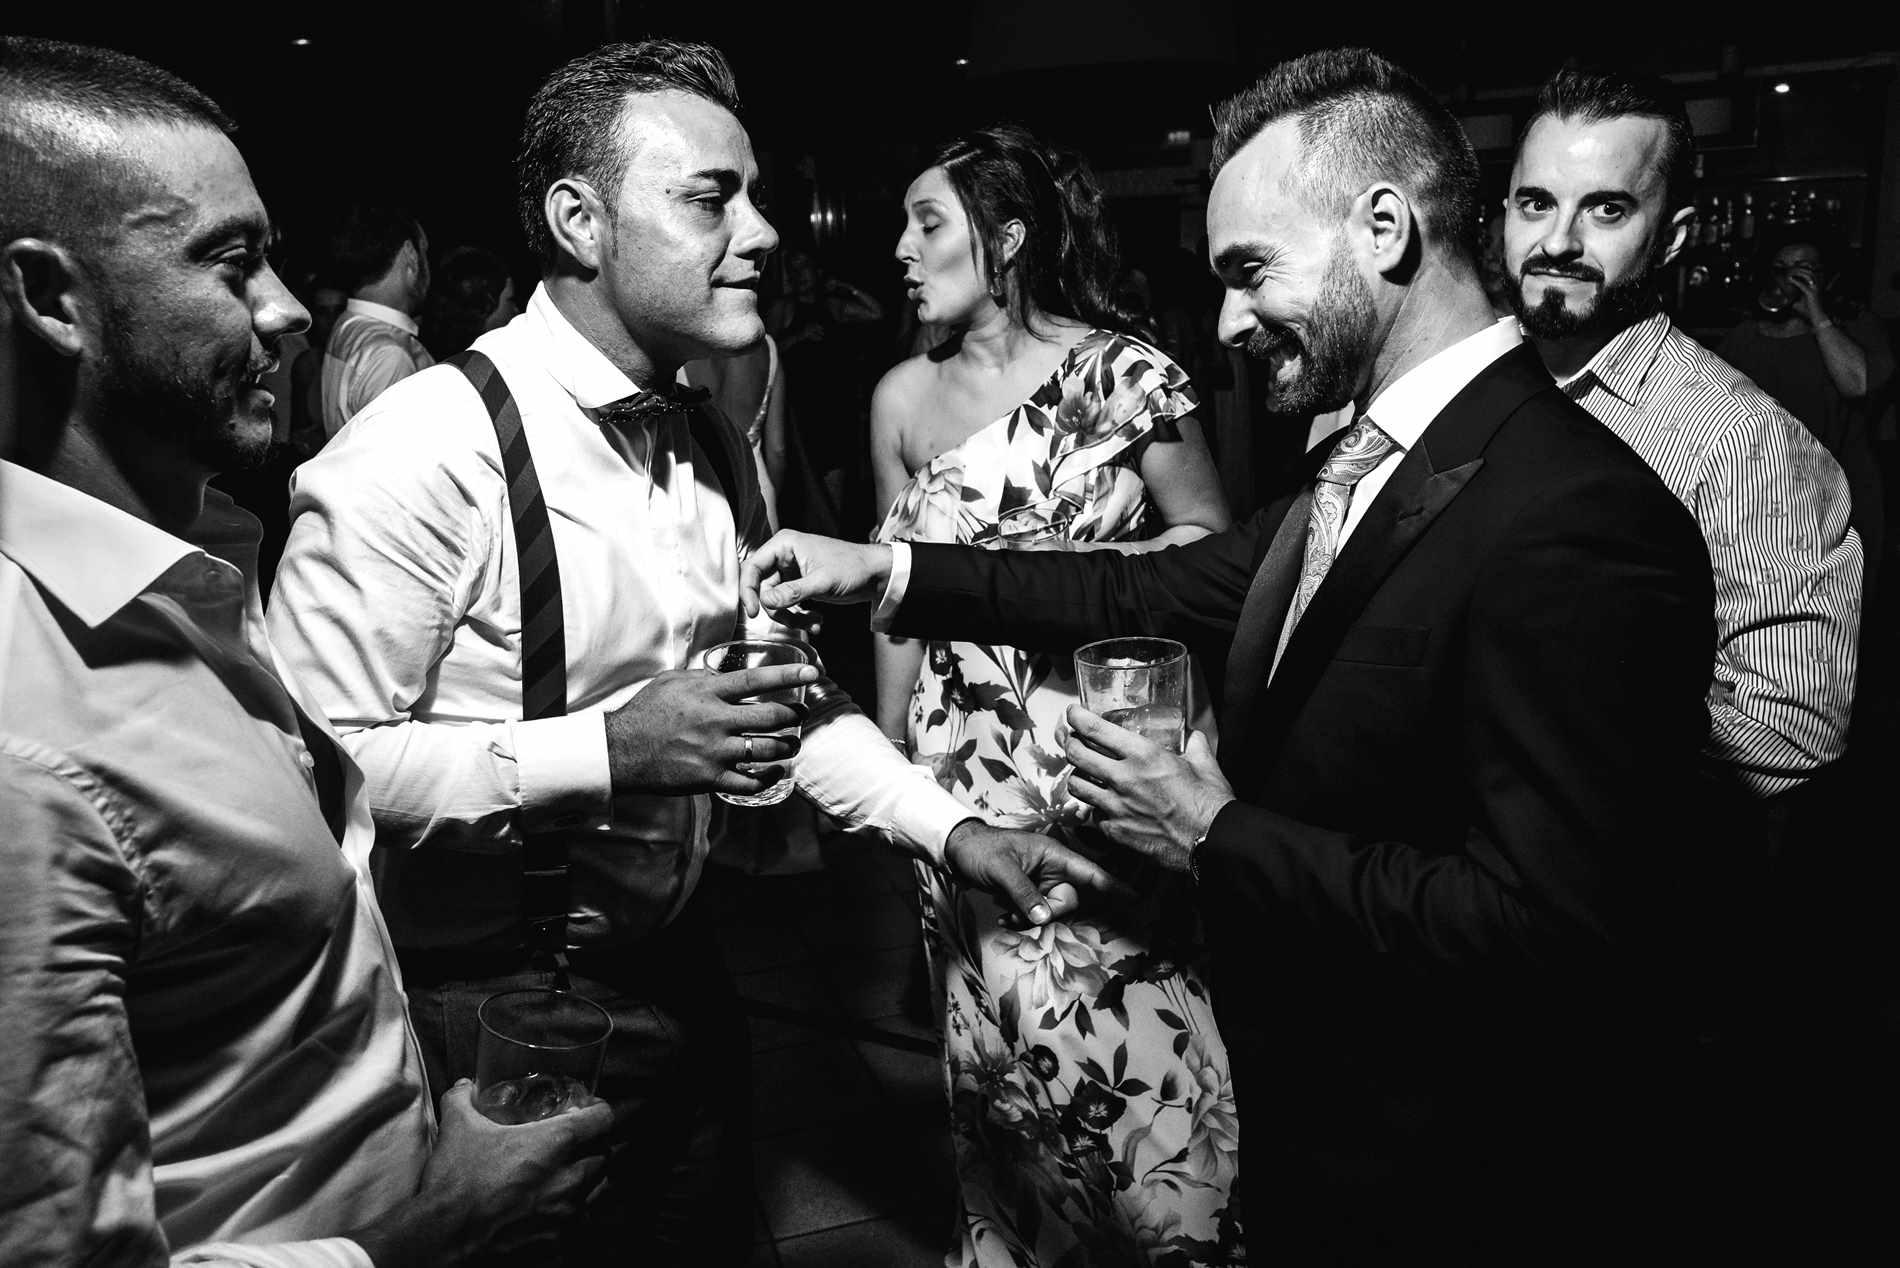 Fotos de la fiesta de la boda